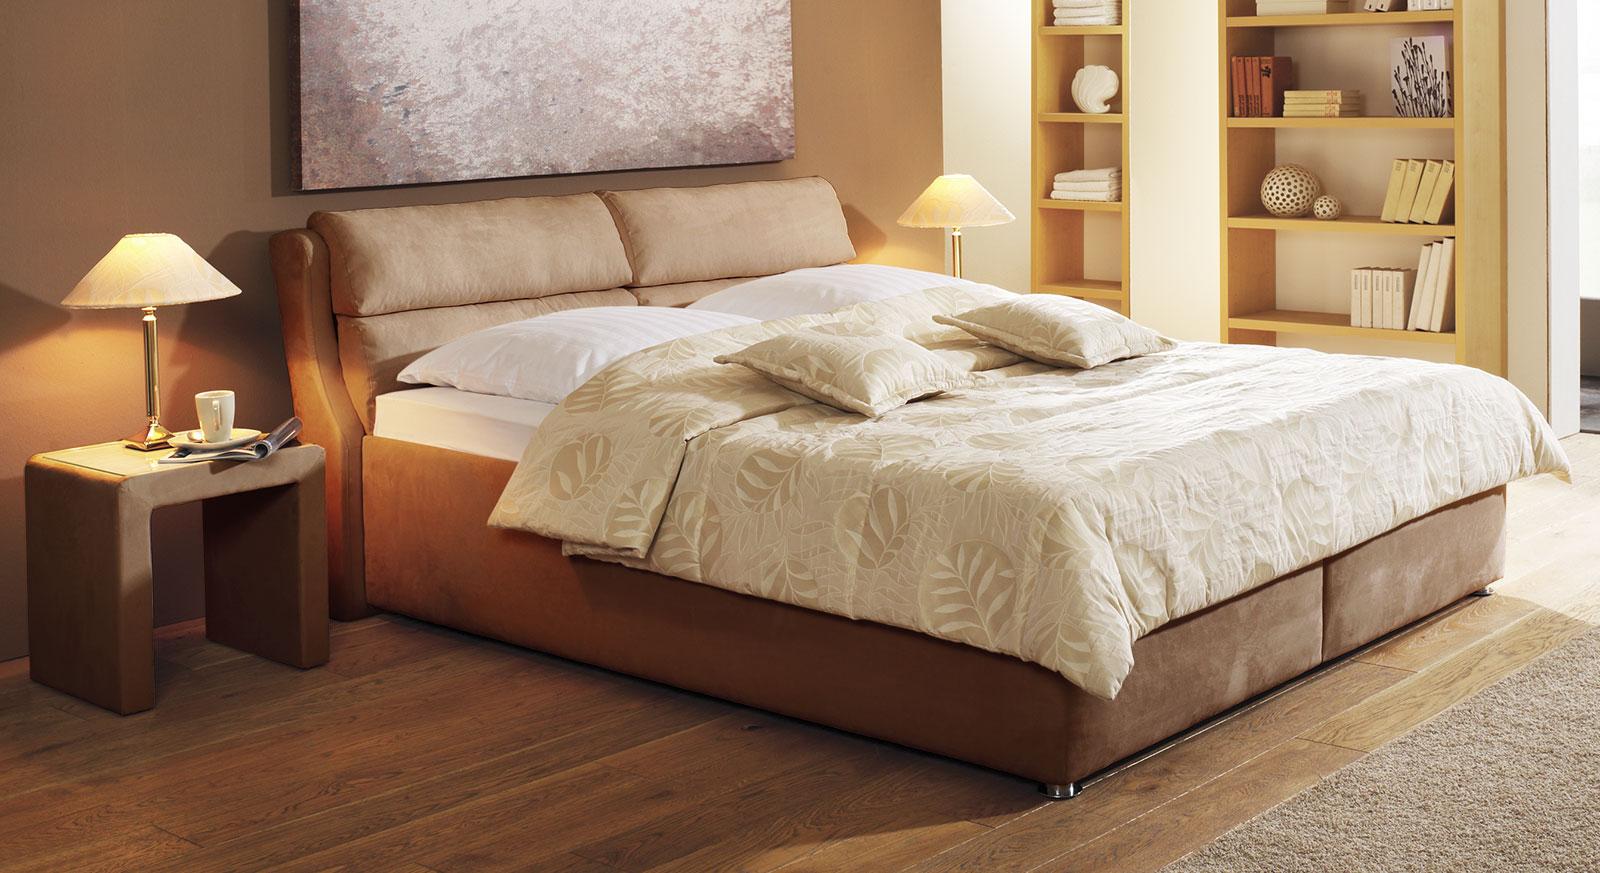 Bett Cremona hellbraun kaufen